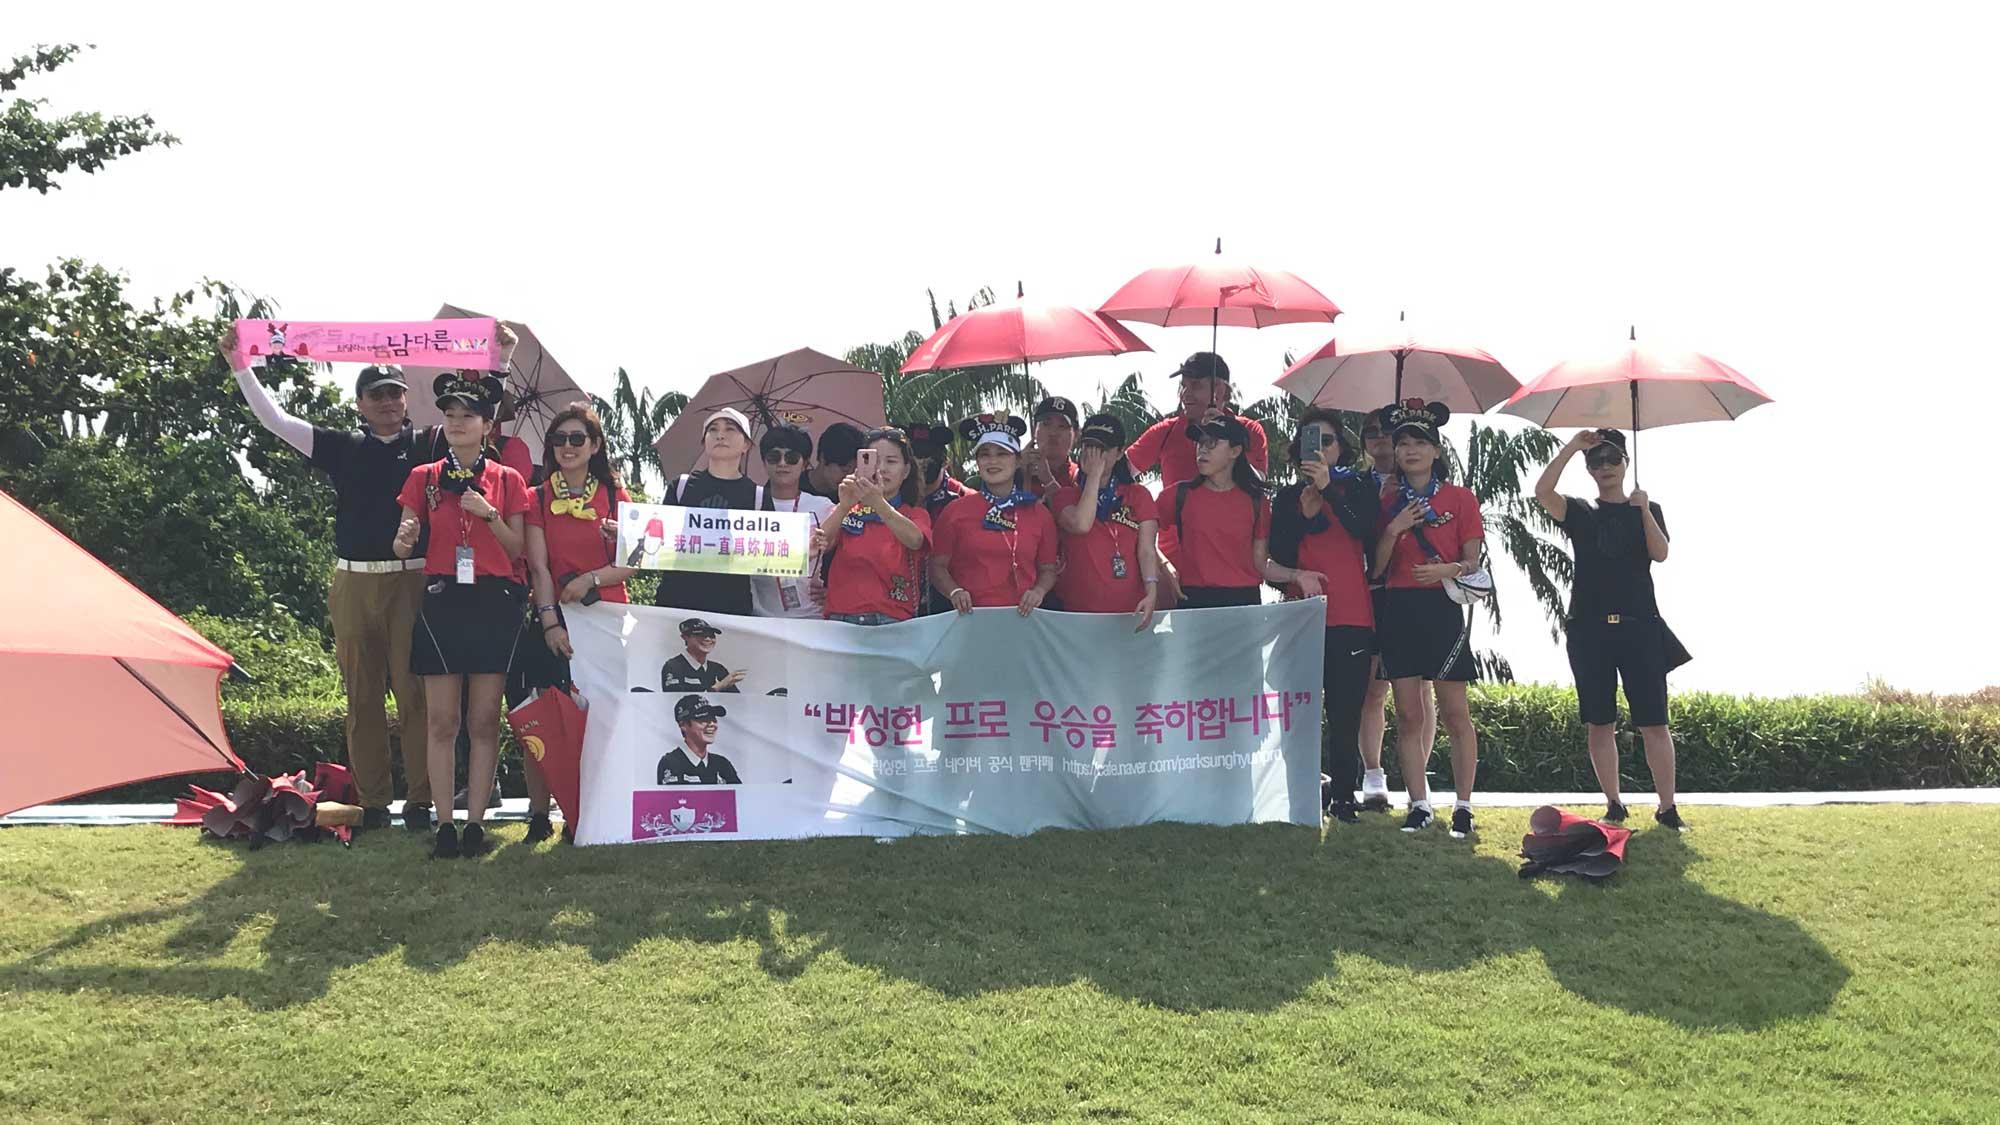 2019 Remarkable Effect of the Namdalla Fan Club Sung Hyun